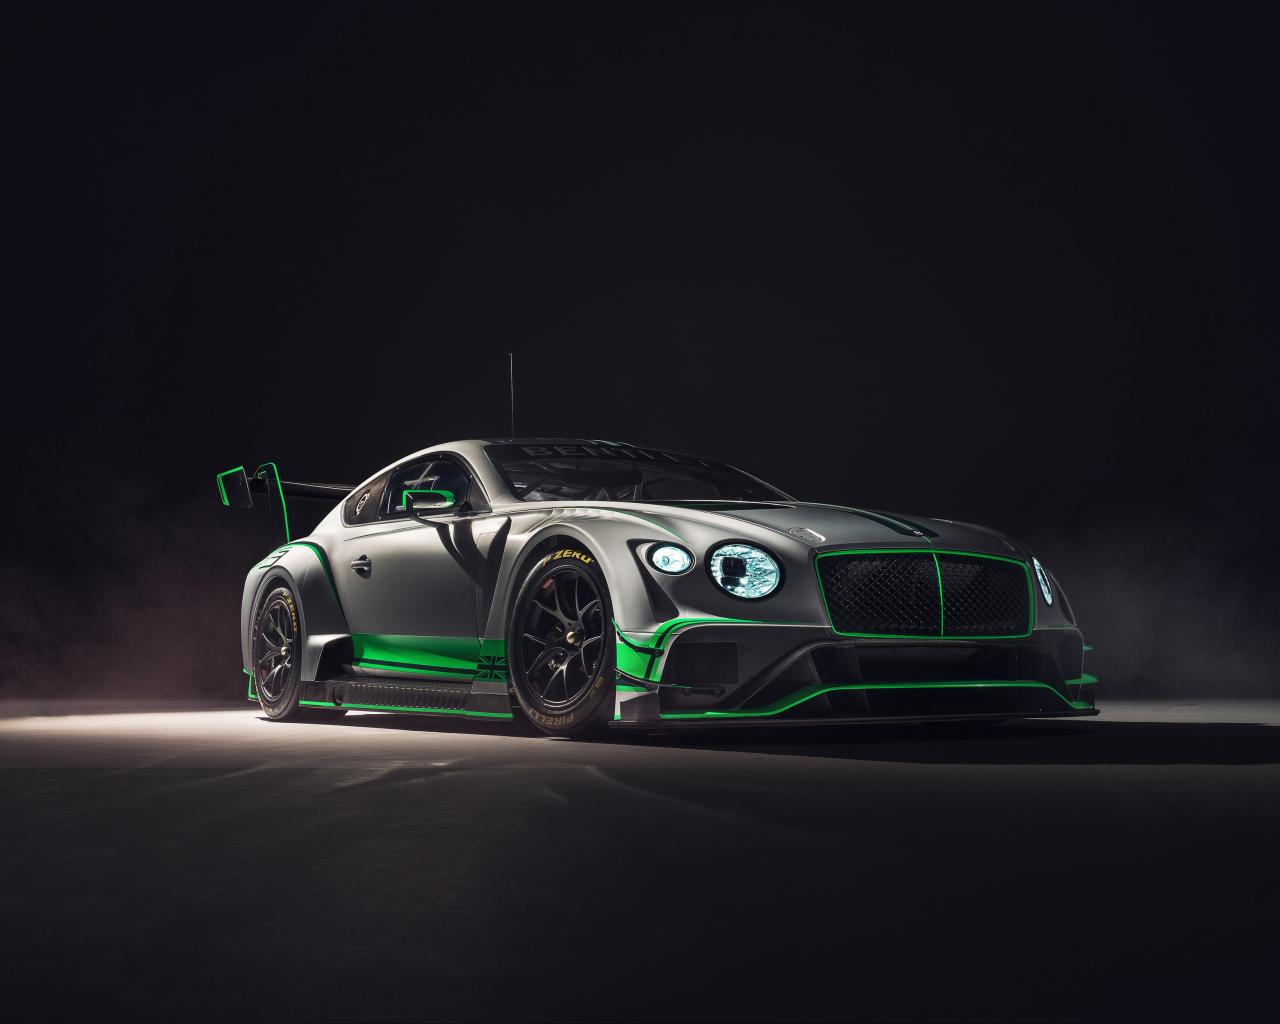 2018 Bentley Continental GT3, 2018 luxury car, 1280x1024 wallpaper